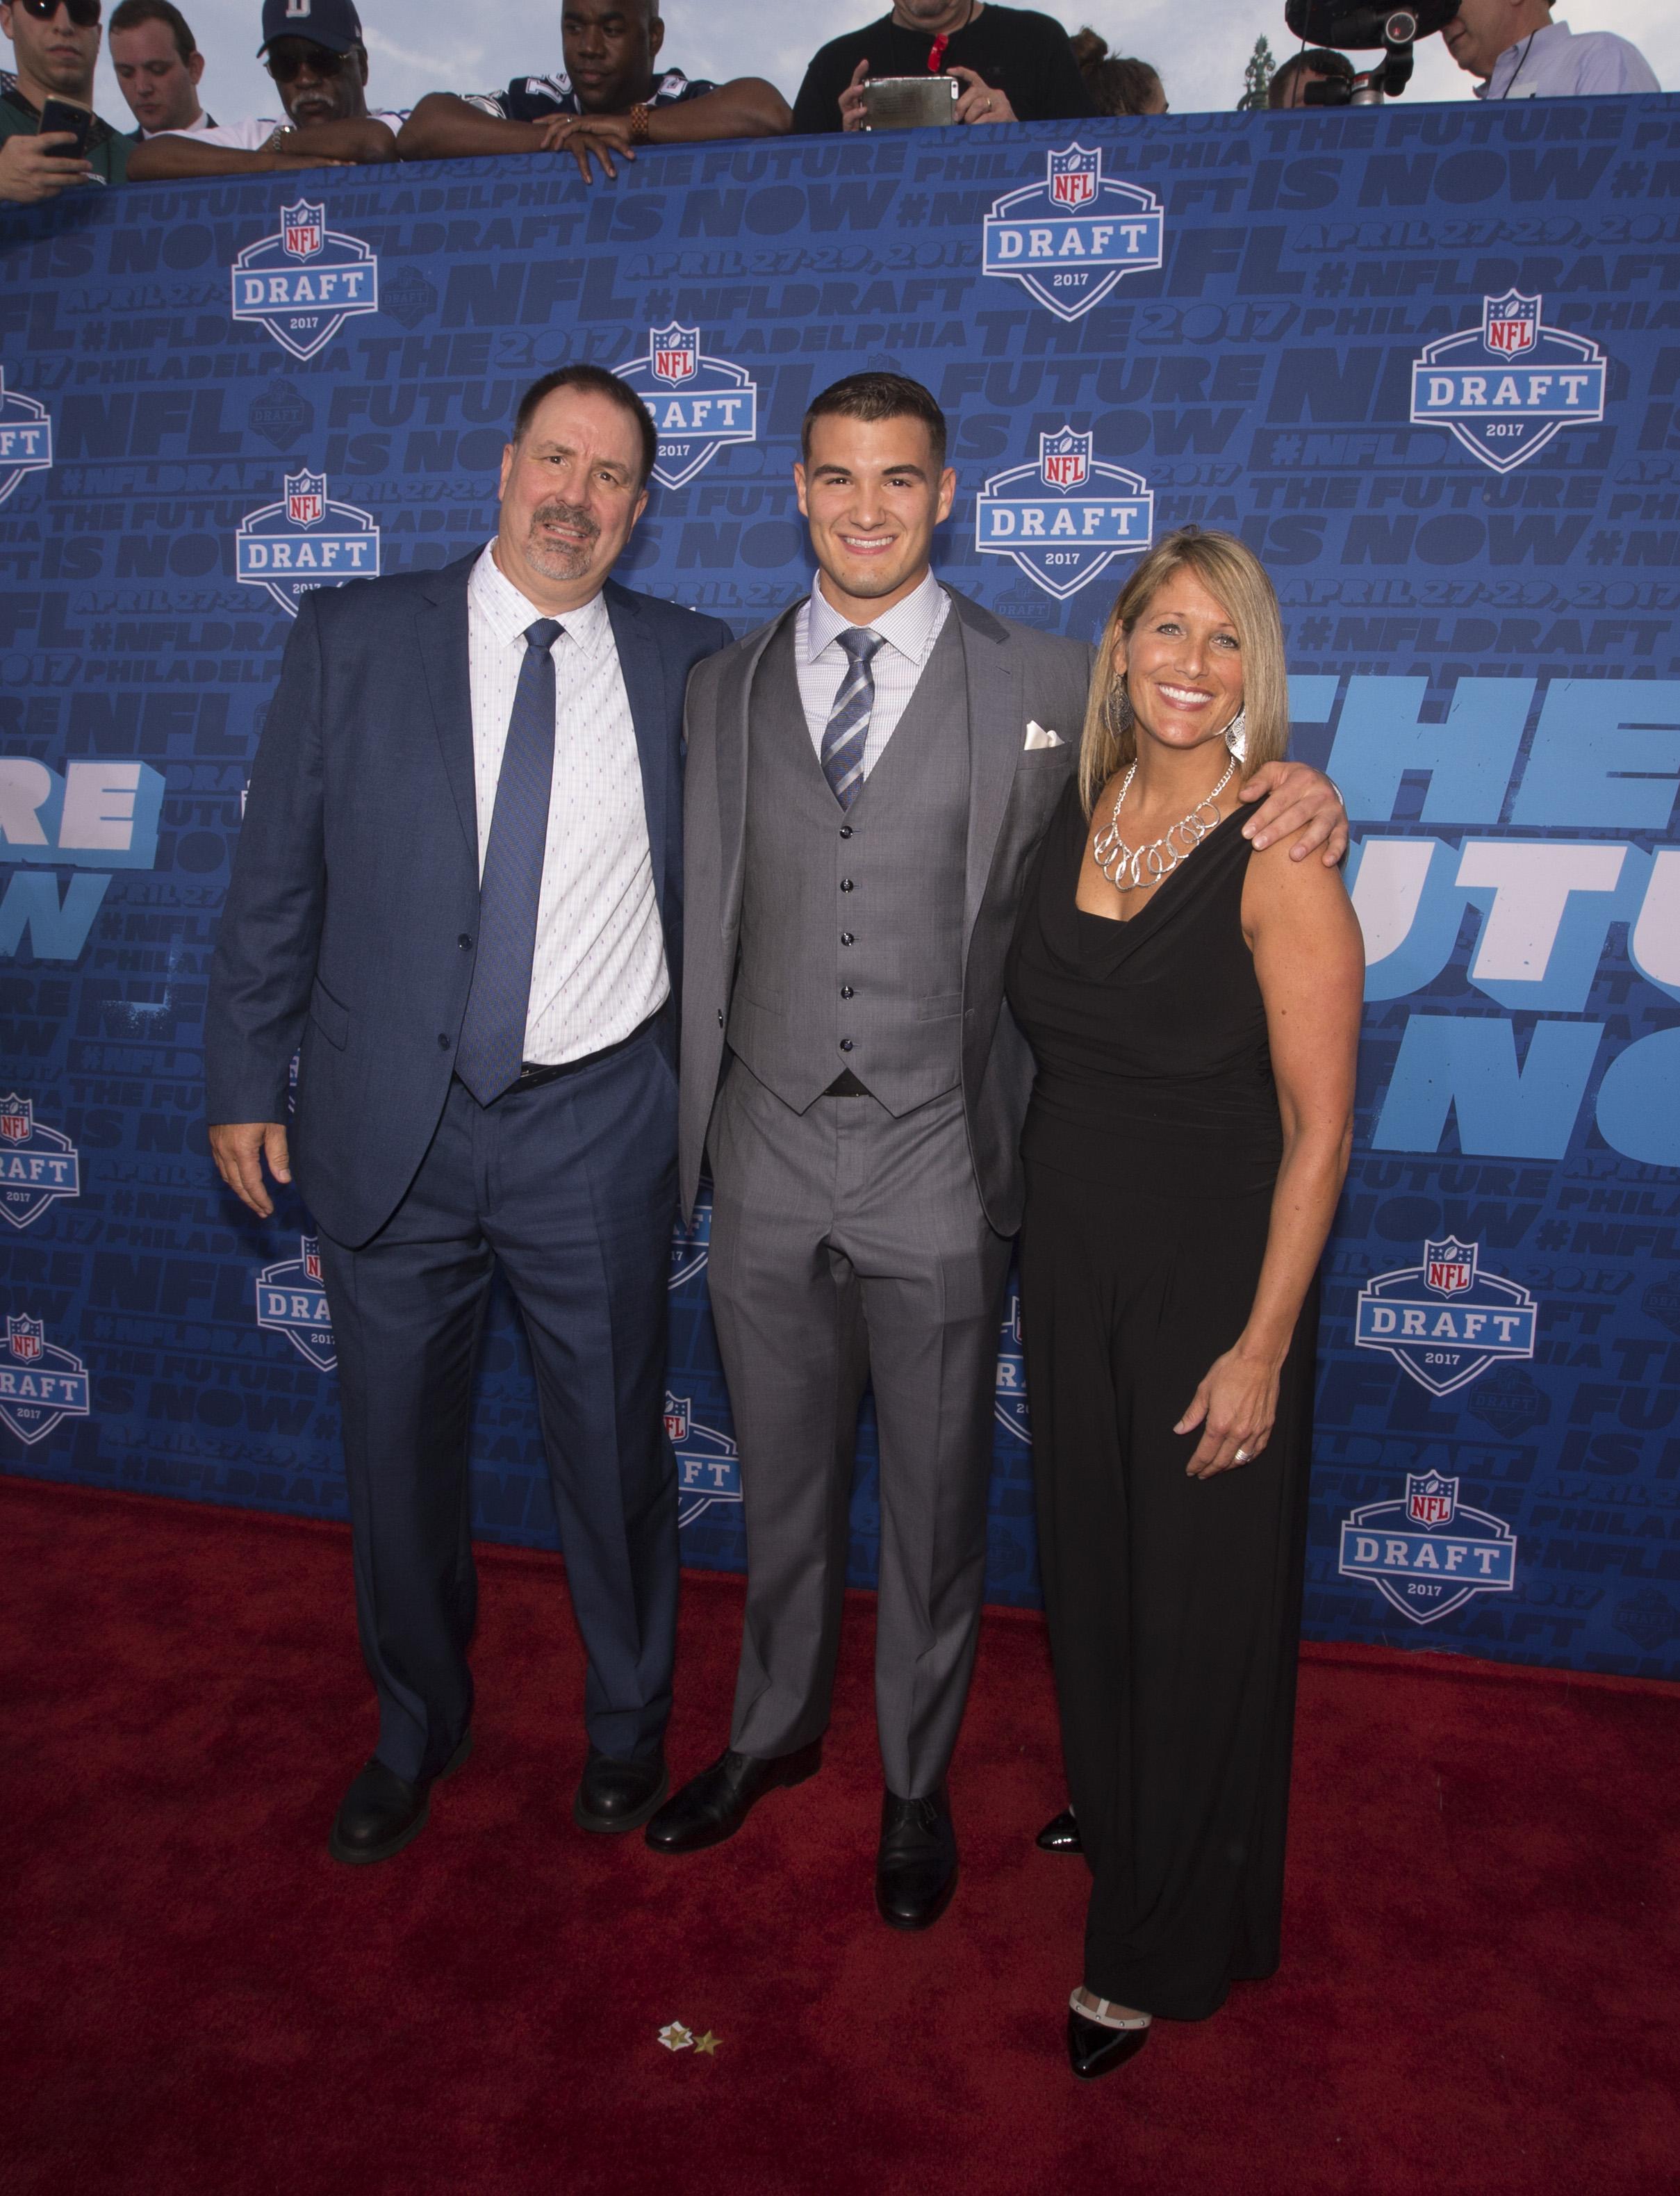 NFL Draft - Red Carpet